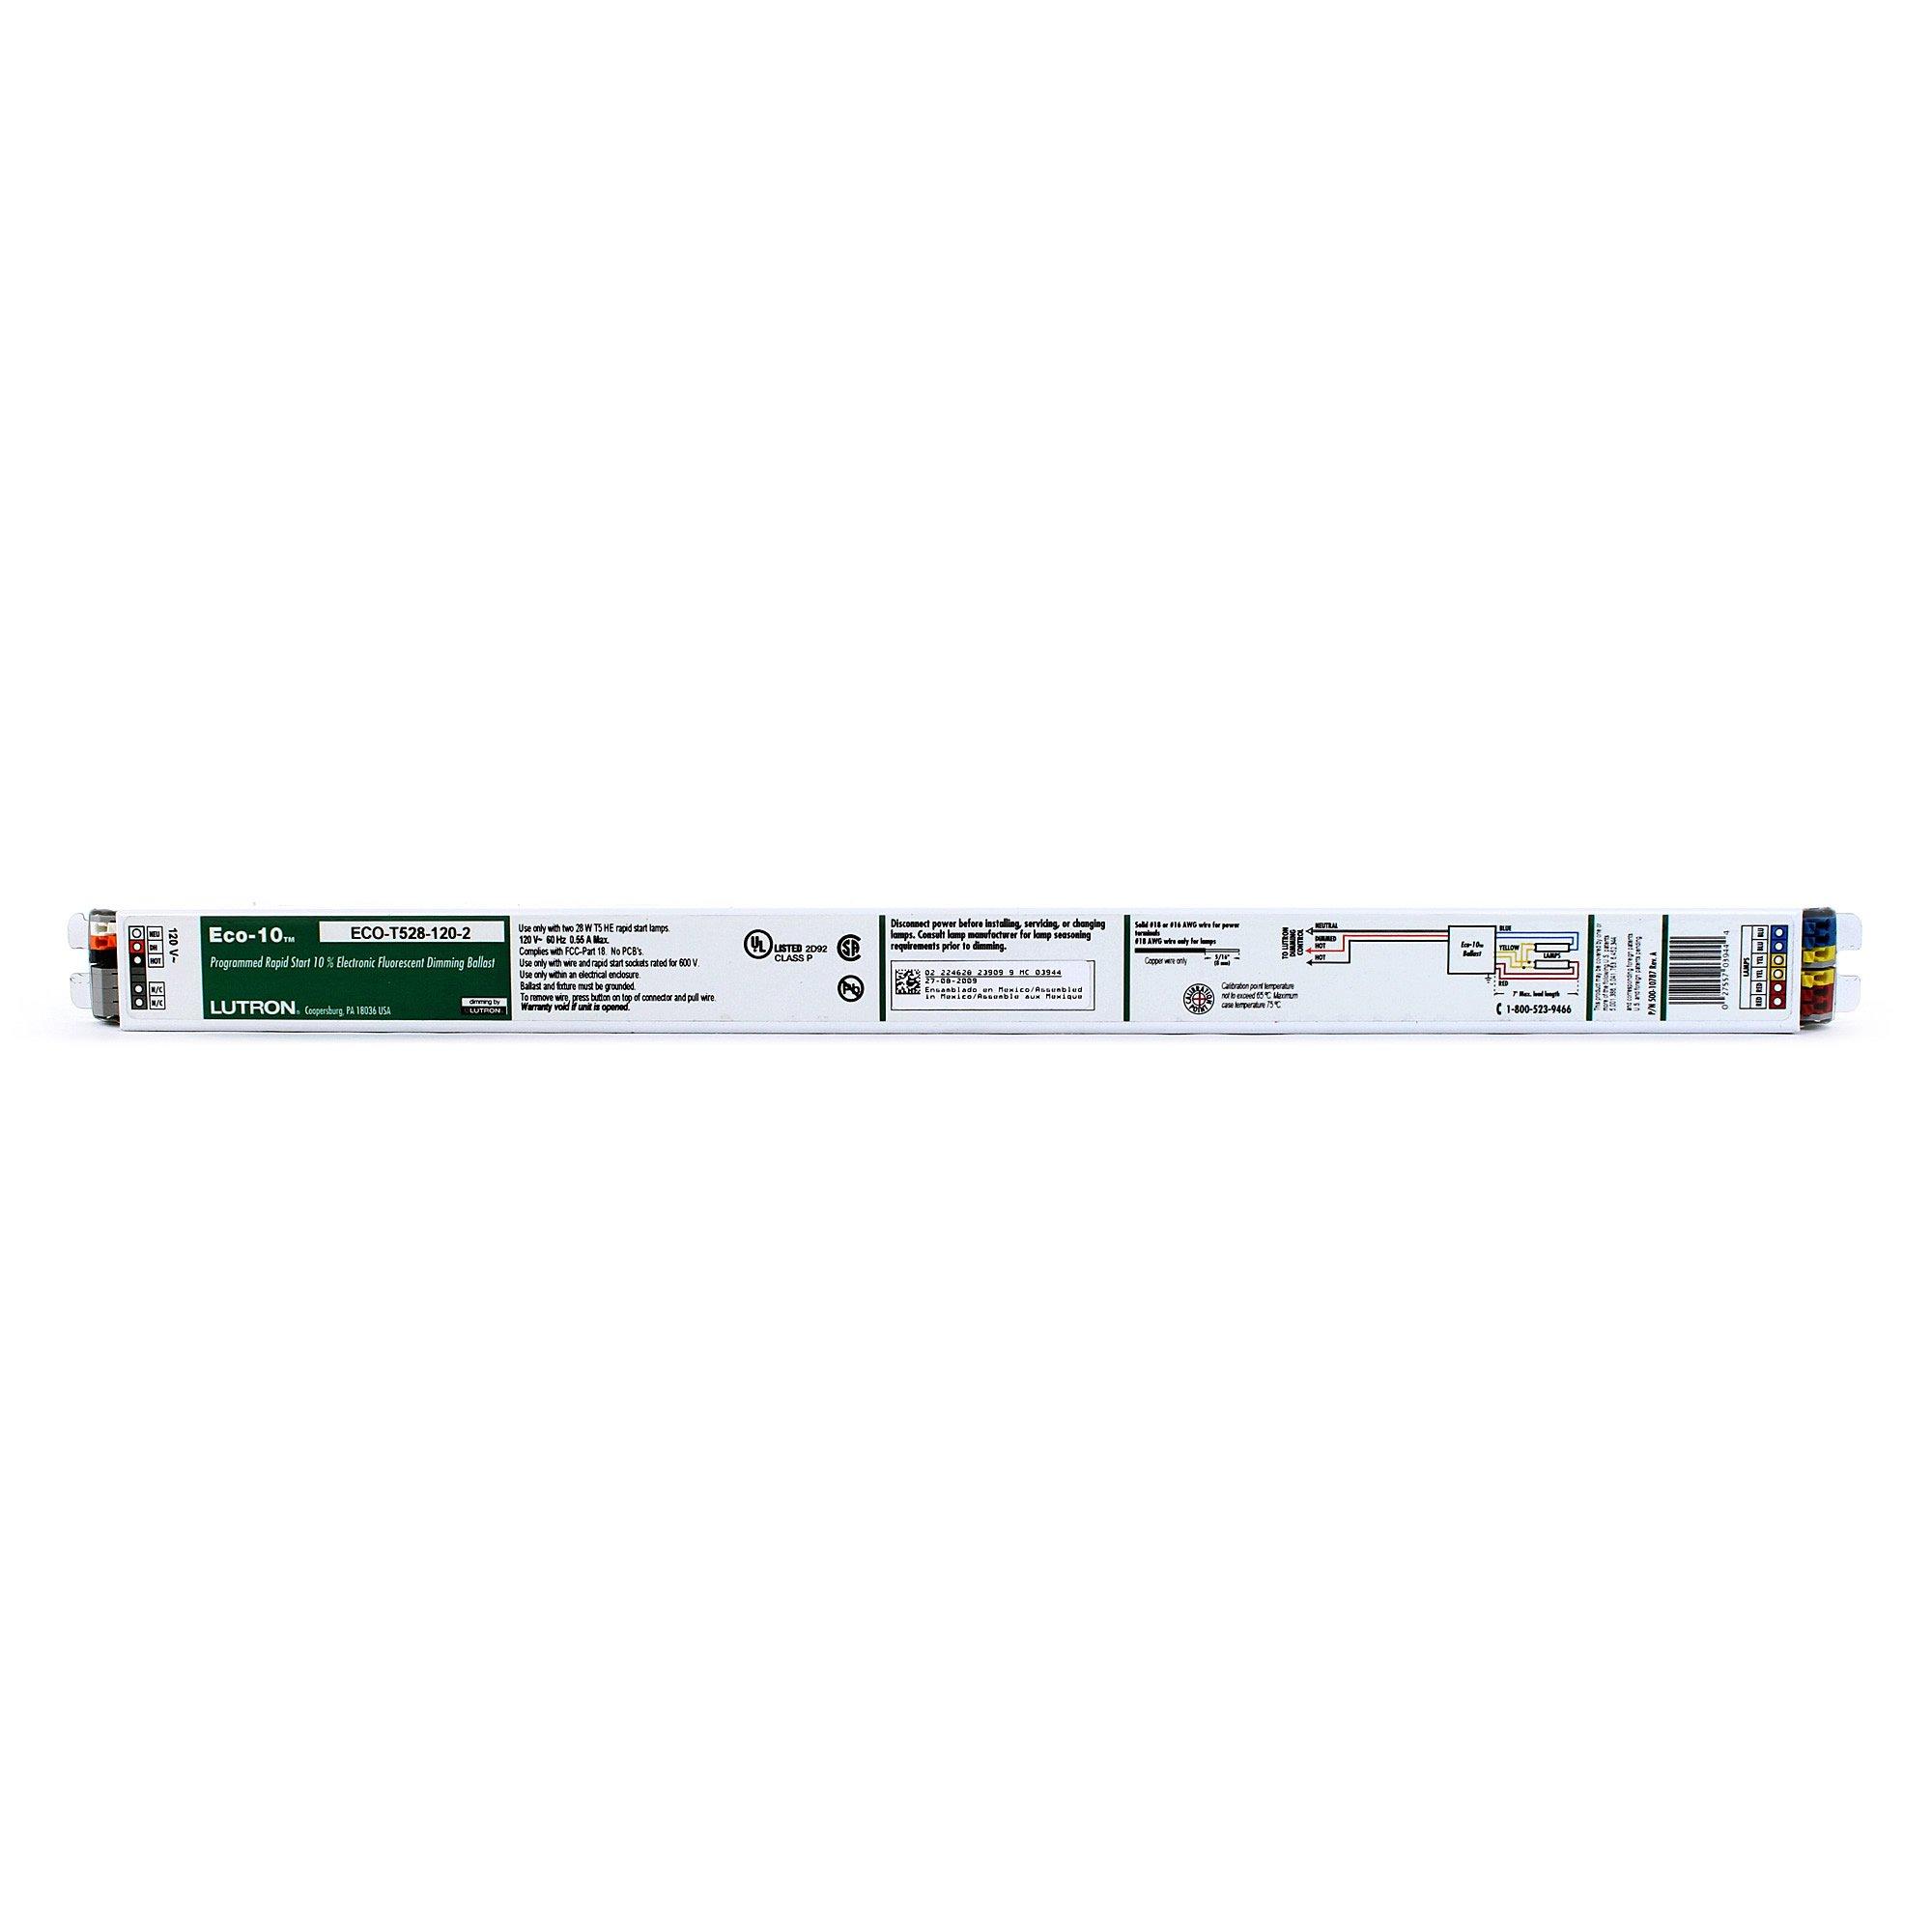 Lutron ECO-T528-120-2 - 120 Volt - Dimmable - Programmed Start - Ballast Factor 1.0 - Power Factor 95 - Min. Temp. Rating 50 Deg. F - Operates 2 F28T5 Fluorescent Lamps